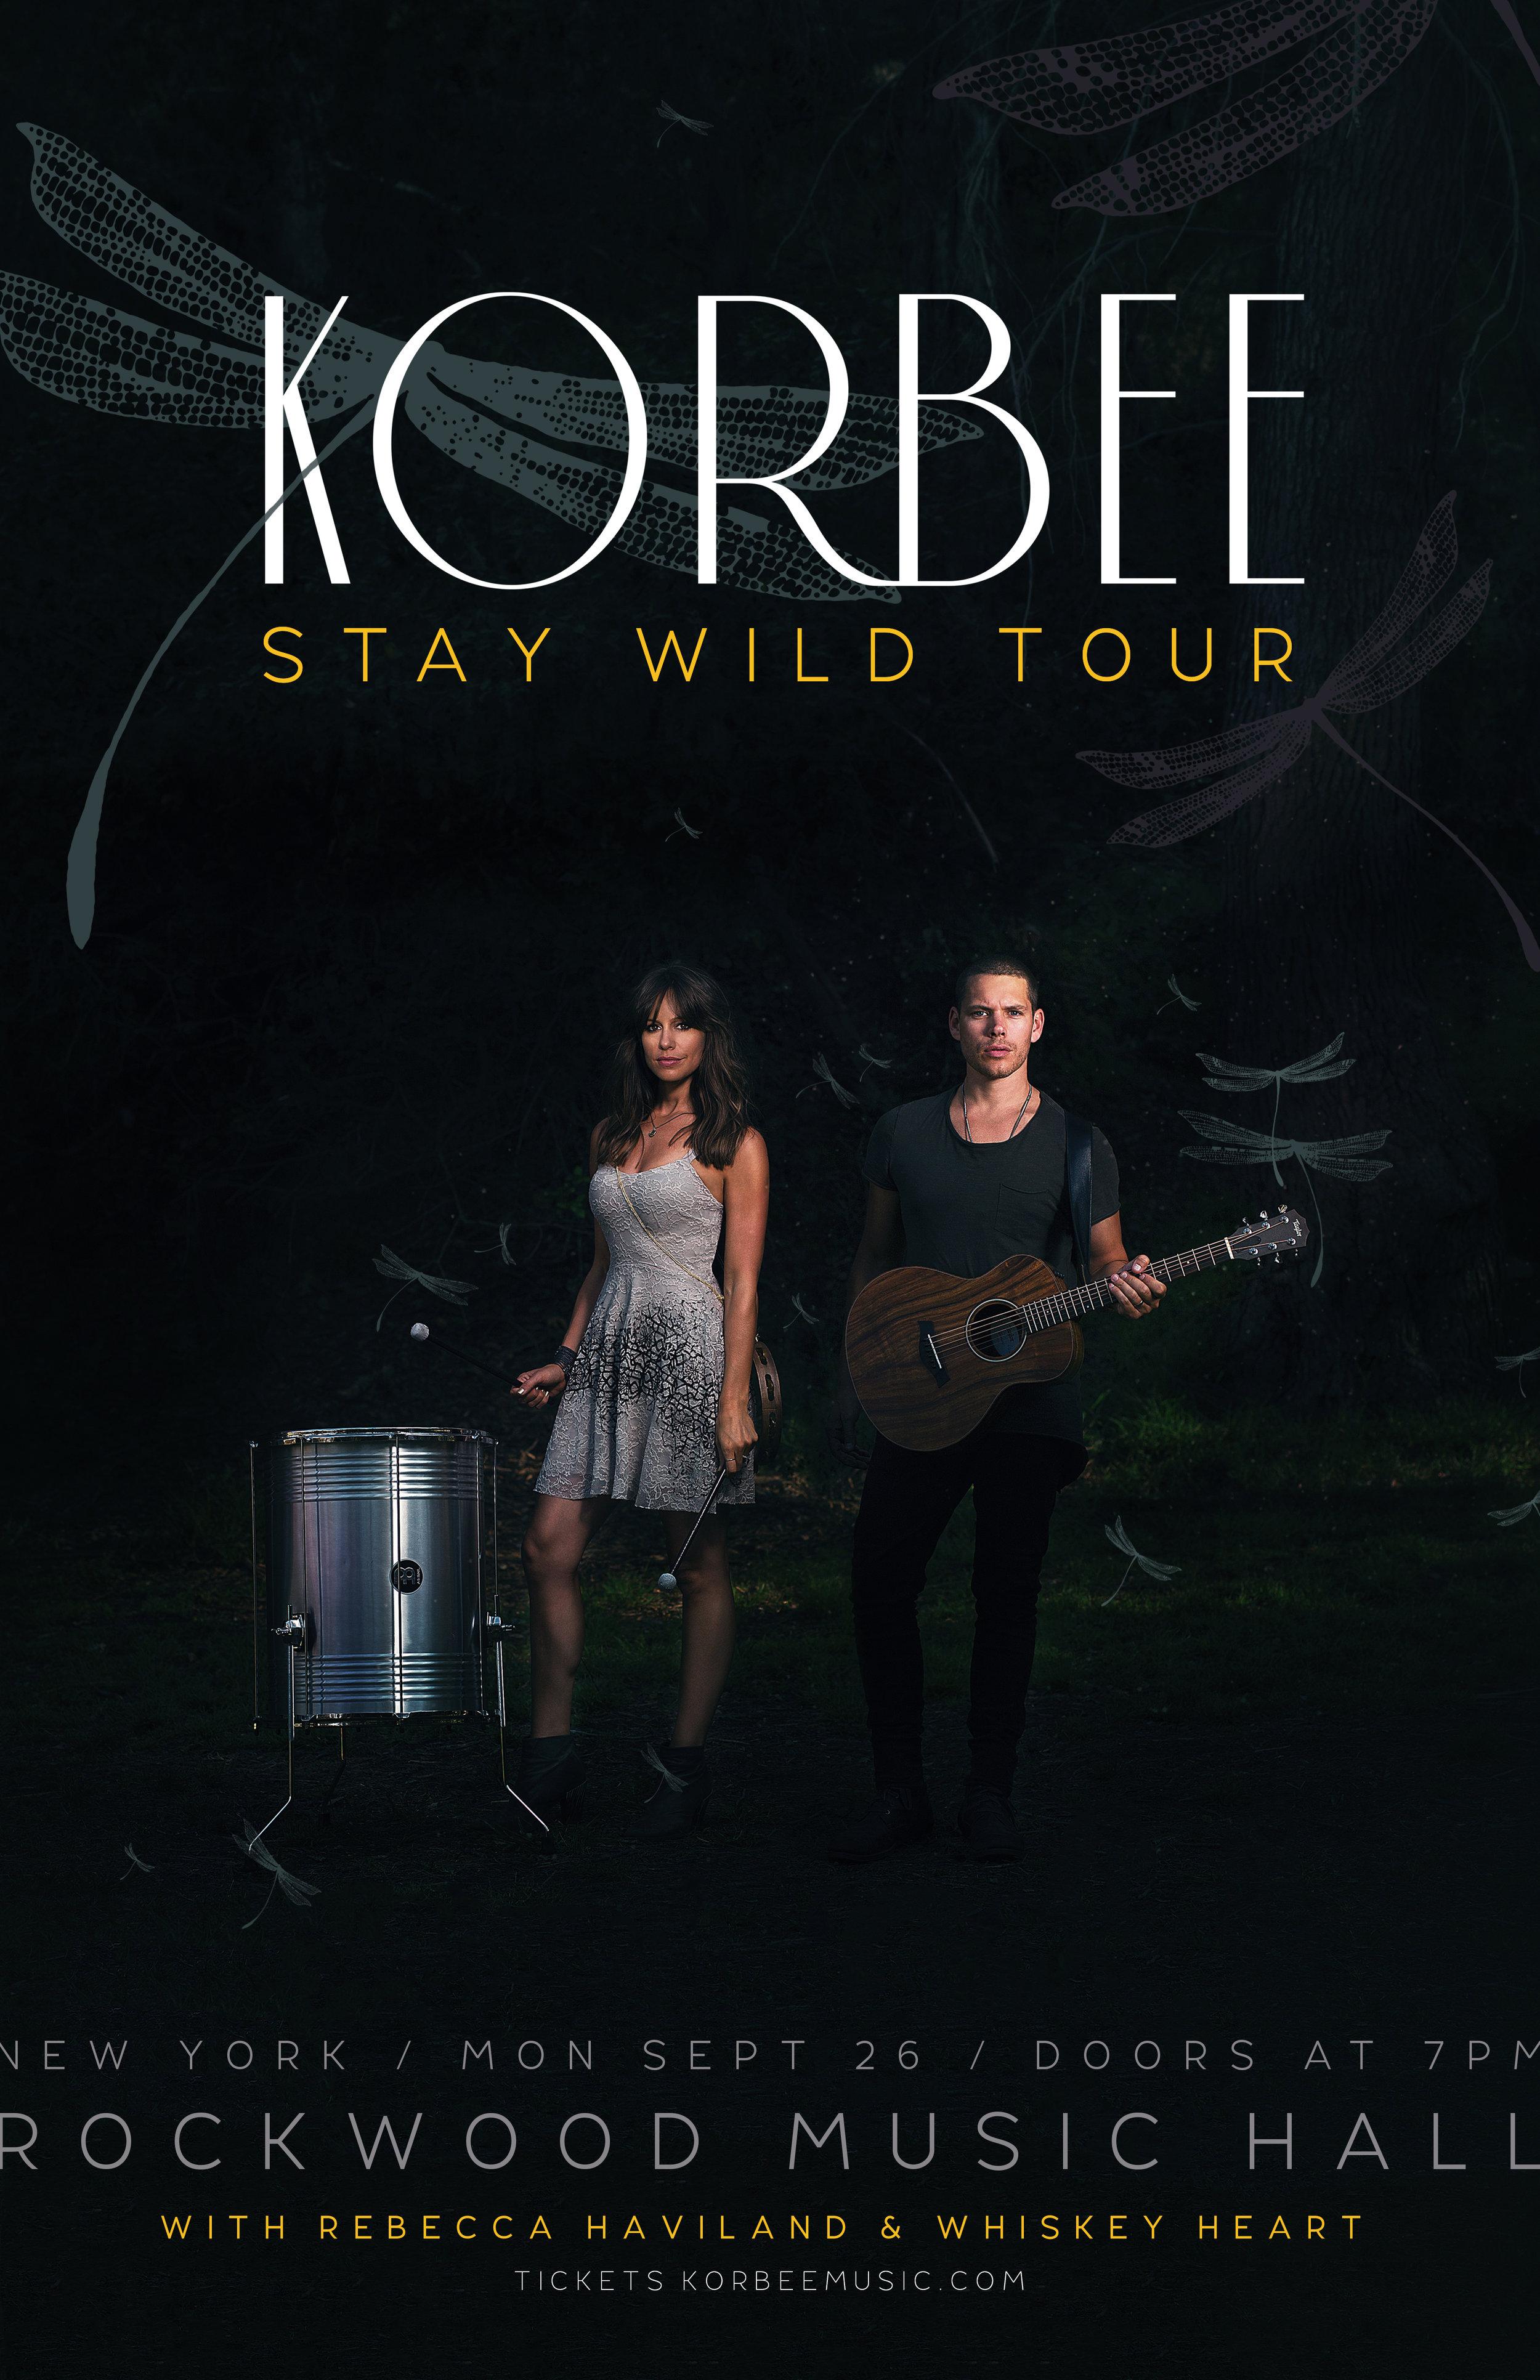 Korbee - Stay Wild Tour - 11 x 17 Poster - New York - Final.jpg